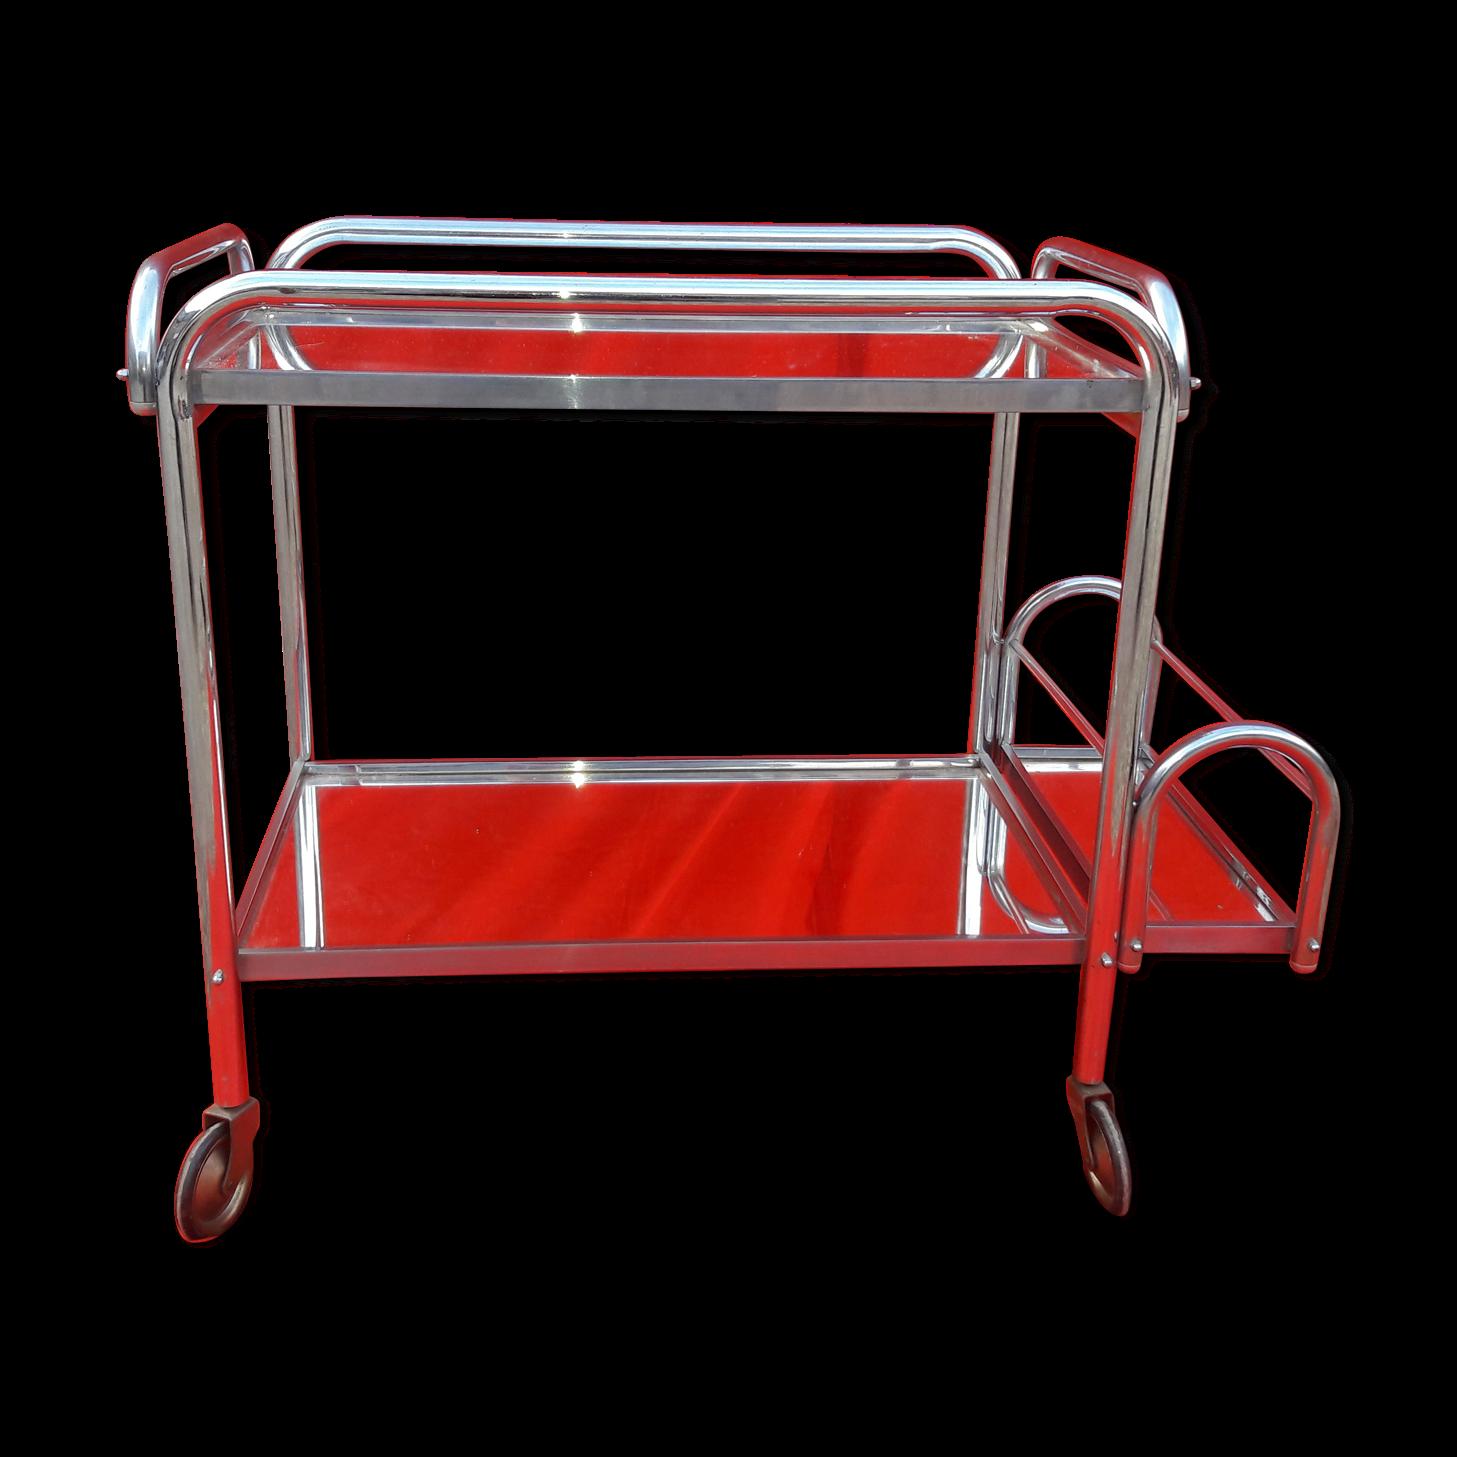 bar roulant de jardin coffre de jardin en tissu daveport taupe with bar roulant de jardin. Black Bedroom Furniture Sets. Home Design Ideas